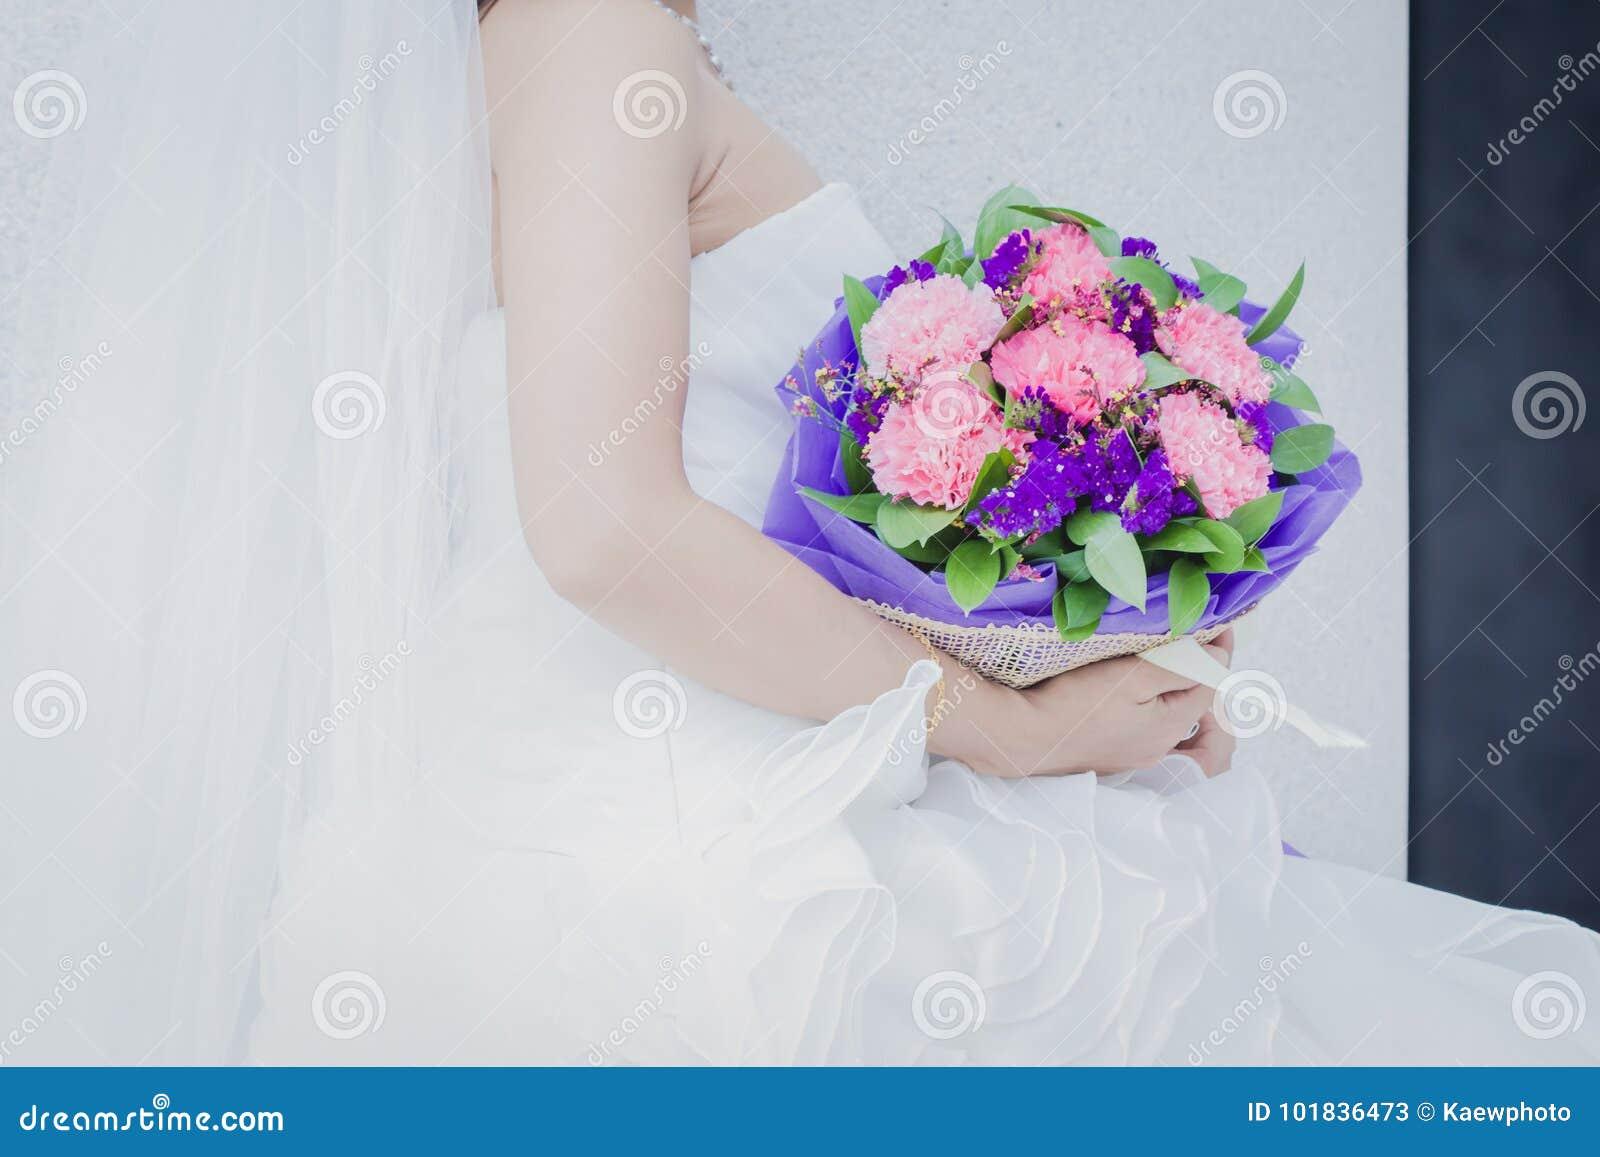 Beautiful Wedding Bouquet In Bride S Hand Stock Image Image Of